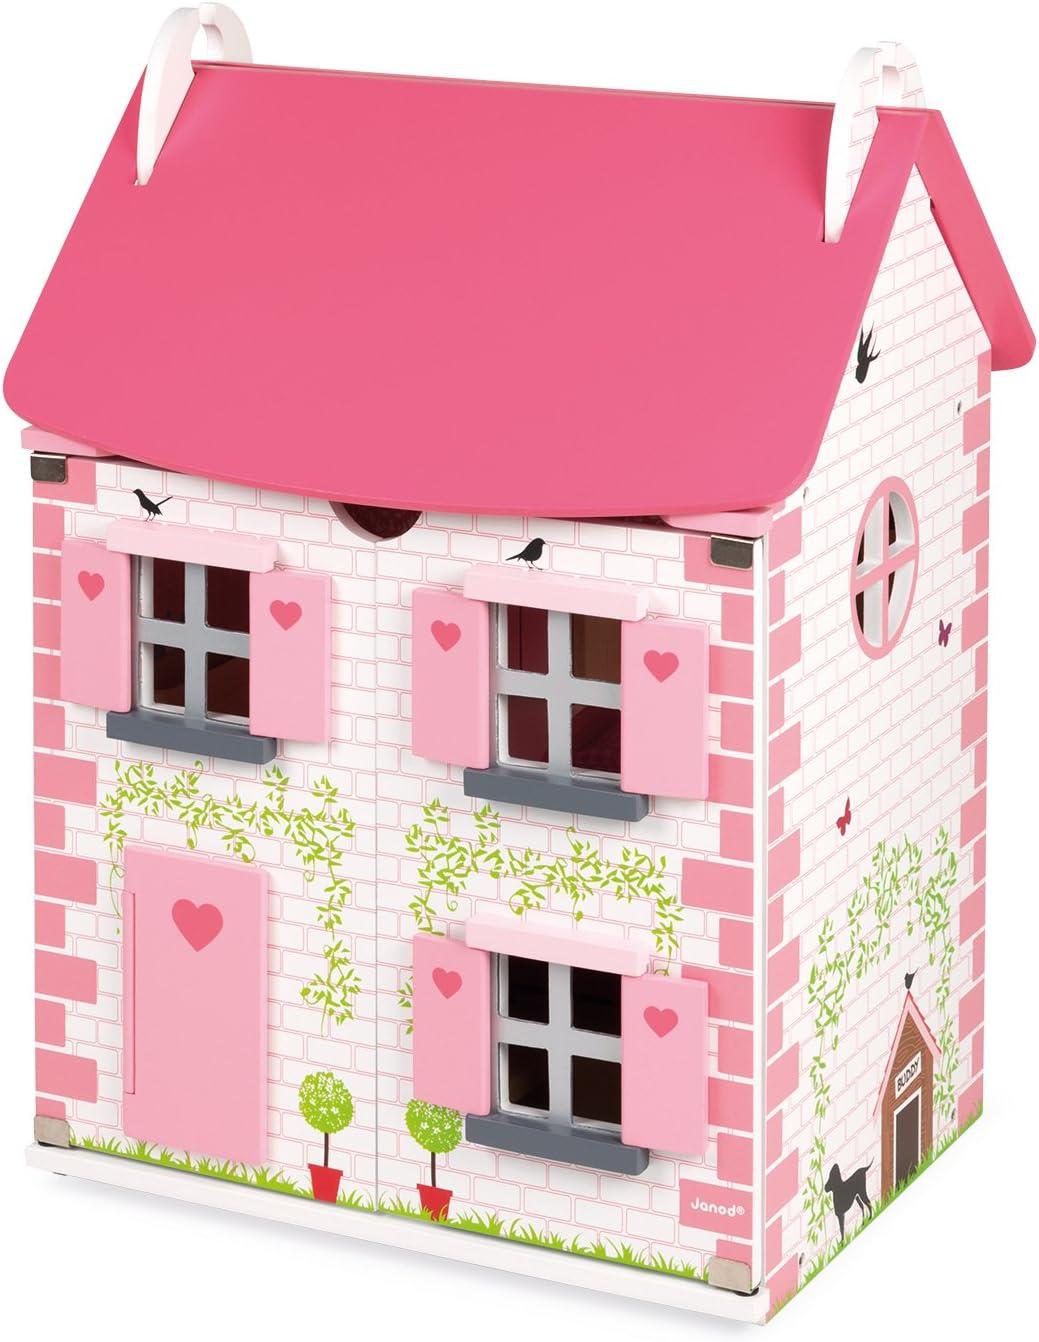 Janod J06581 Mademoiselle Dolls House Game